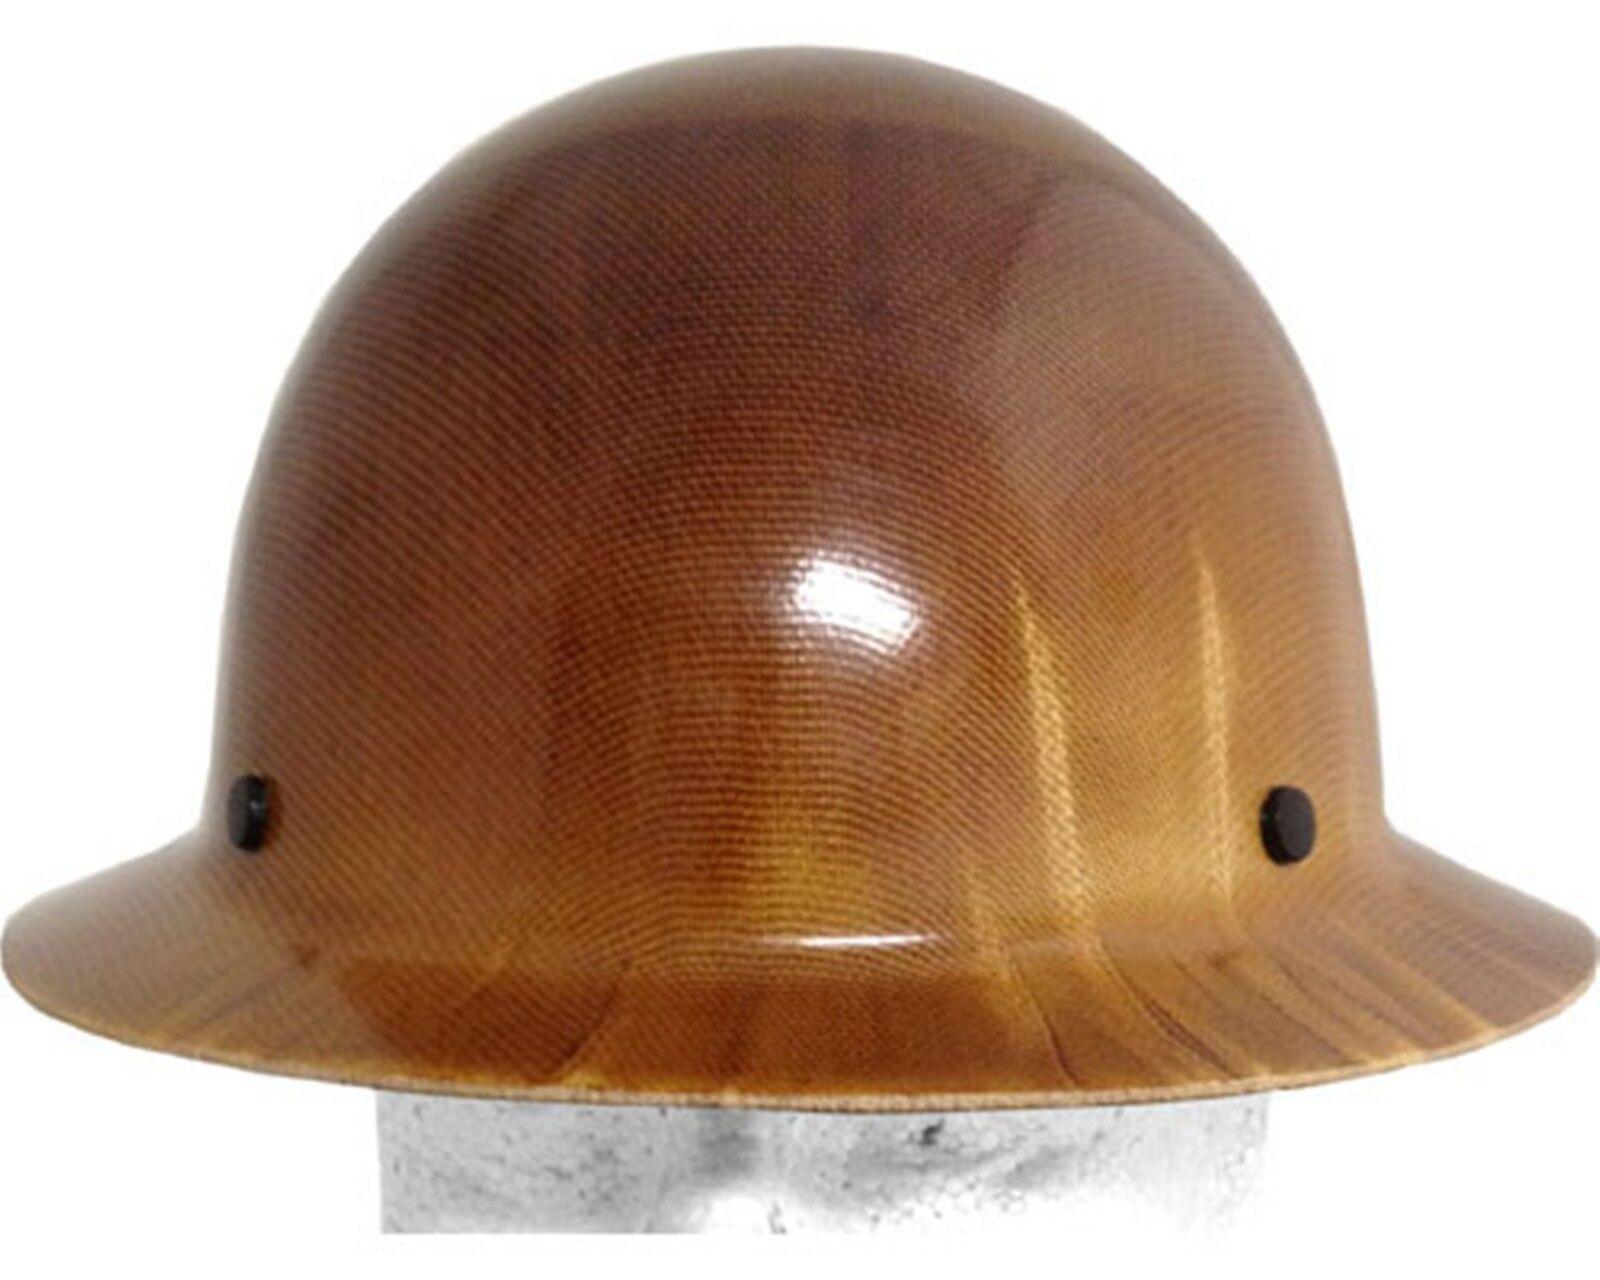 msa skullgard fiberglass fb hard hat with ratchet or pin